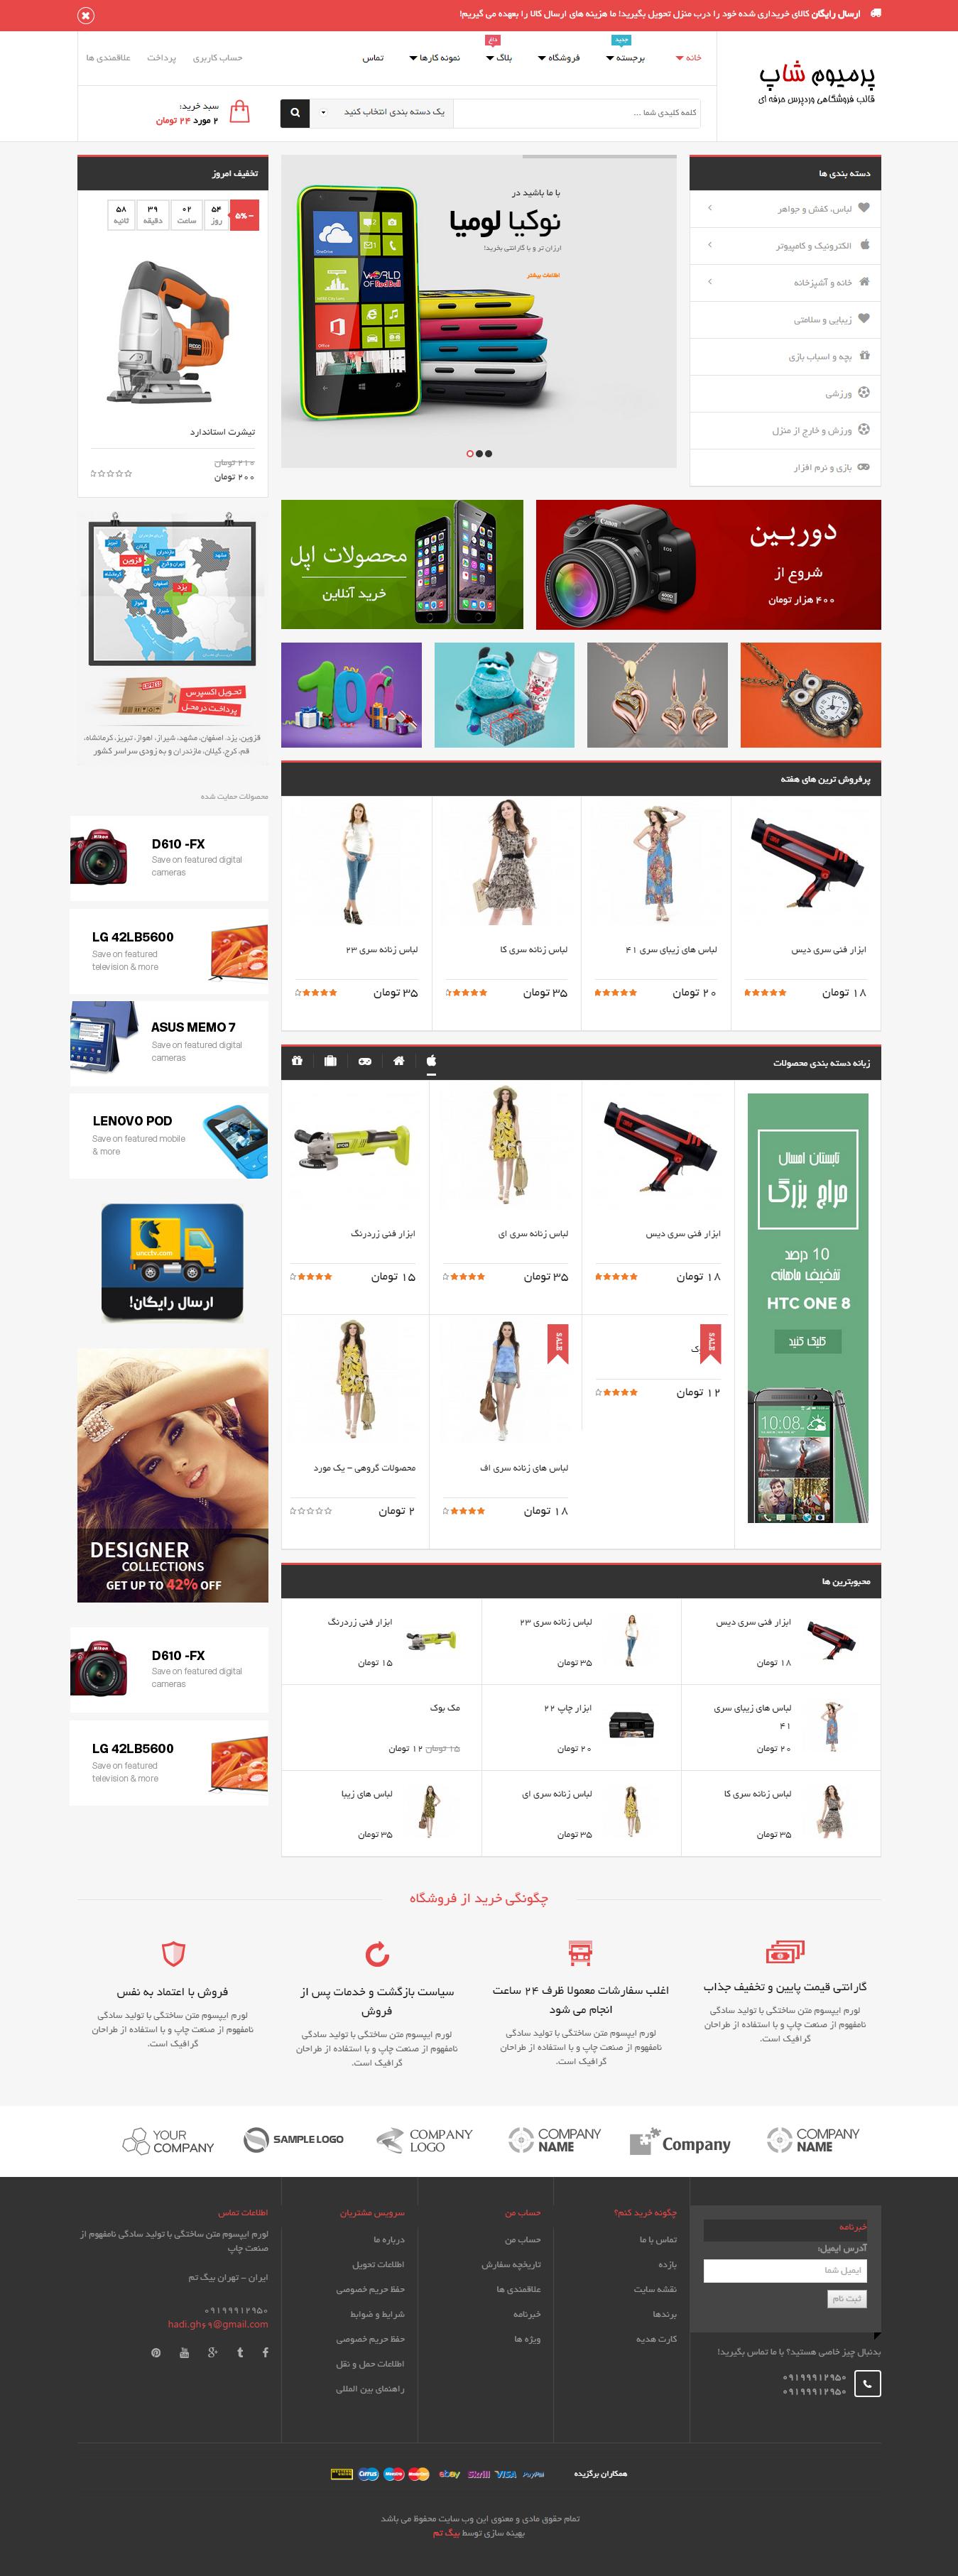 قالب وردپرس فروشگاهی پرمیوم شایپ PremiumShop